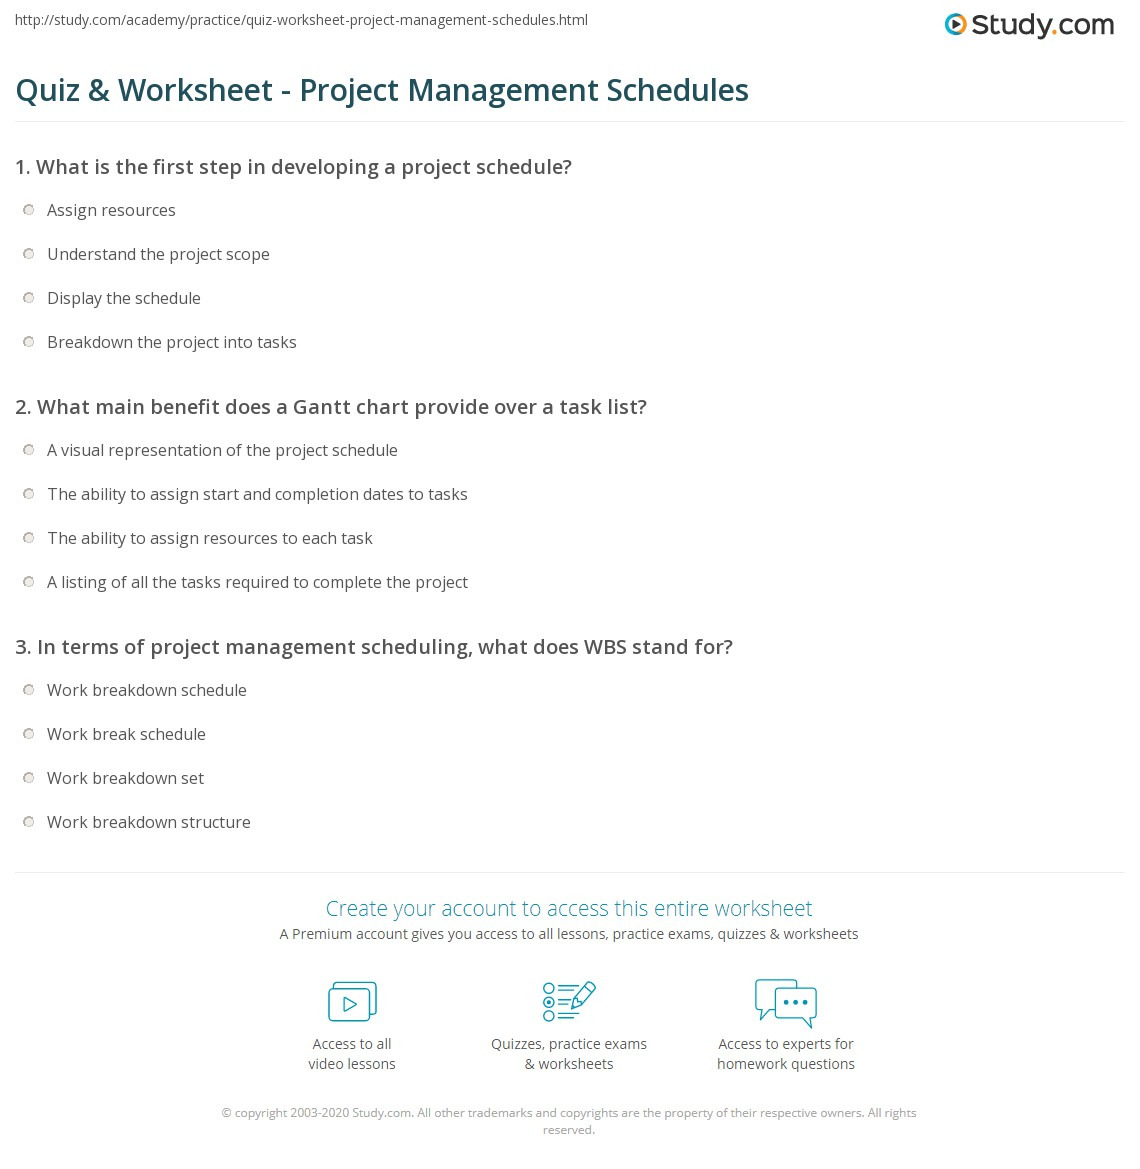 Quiz Worksheet Project Management Schedules Study